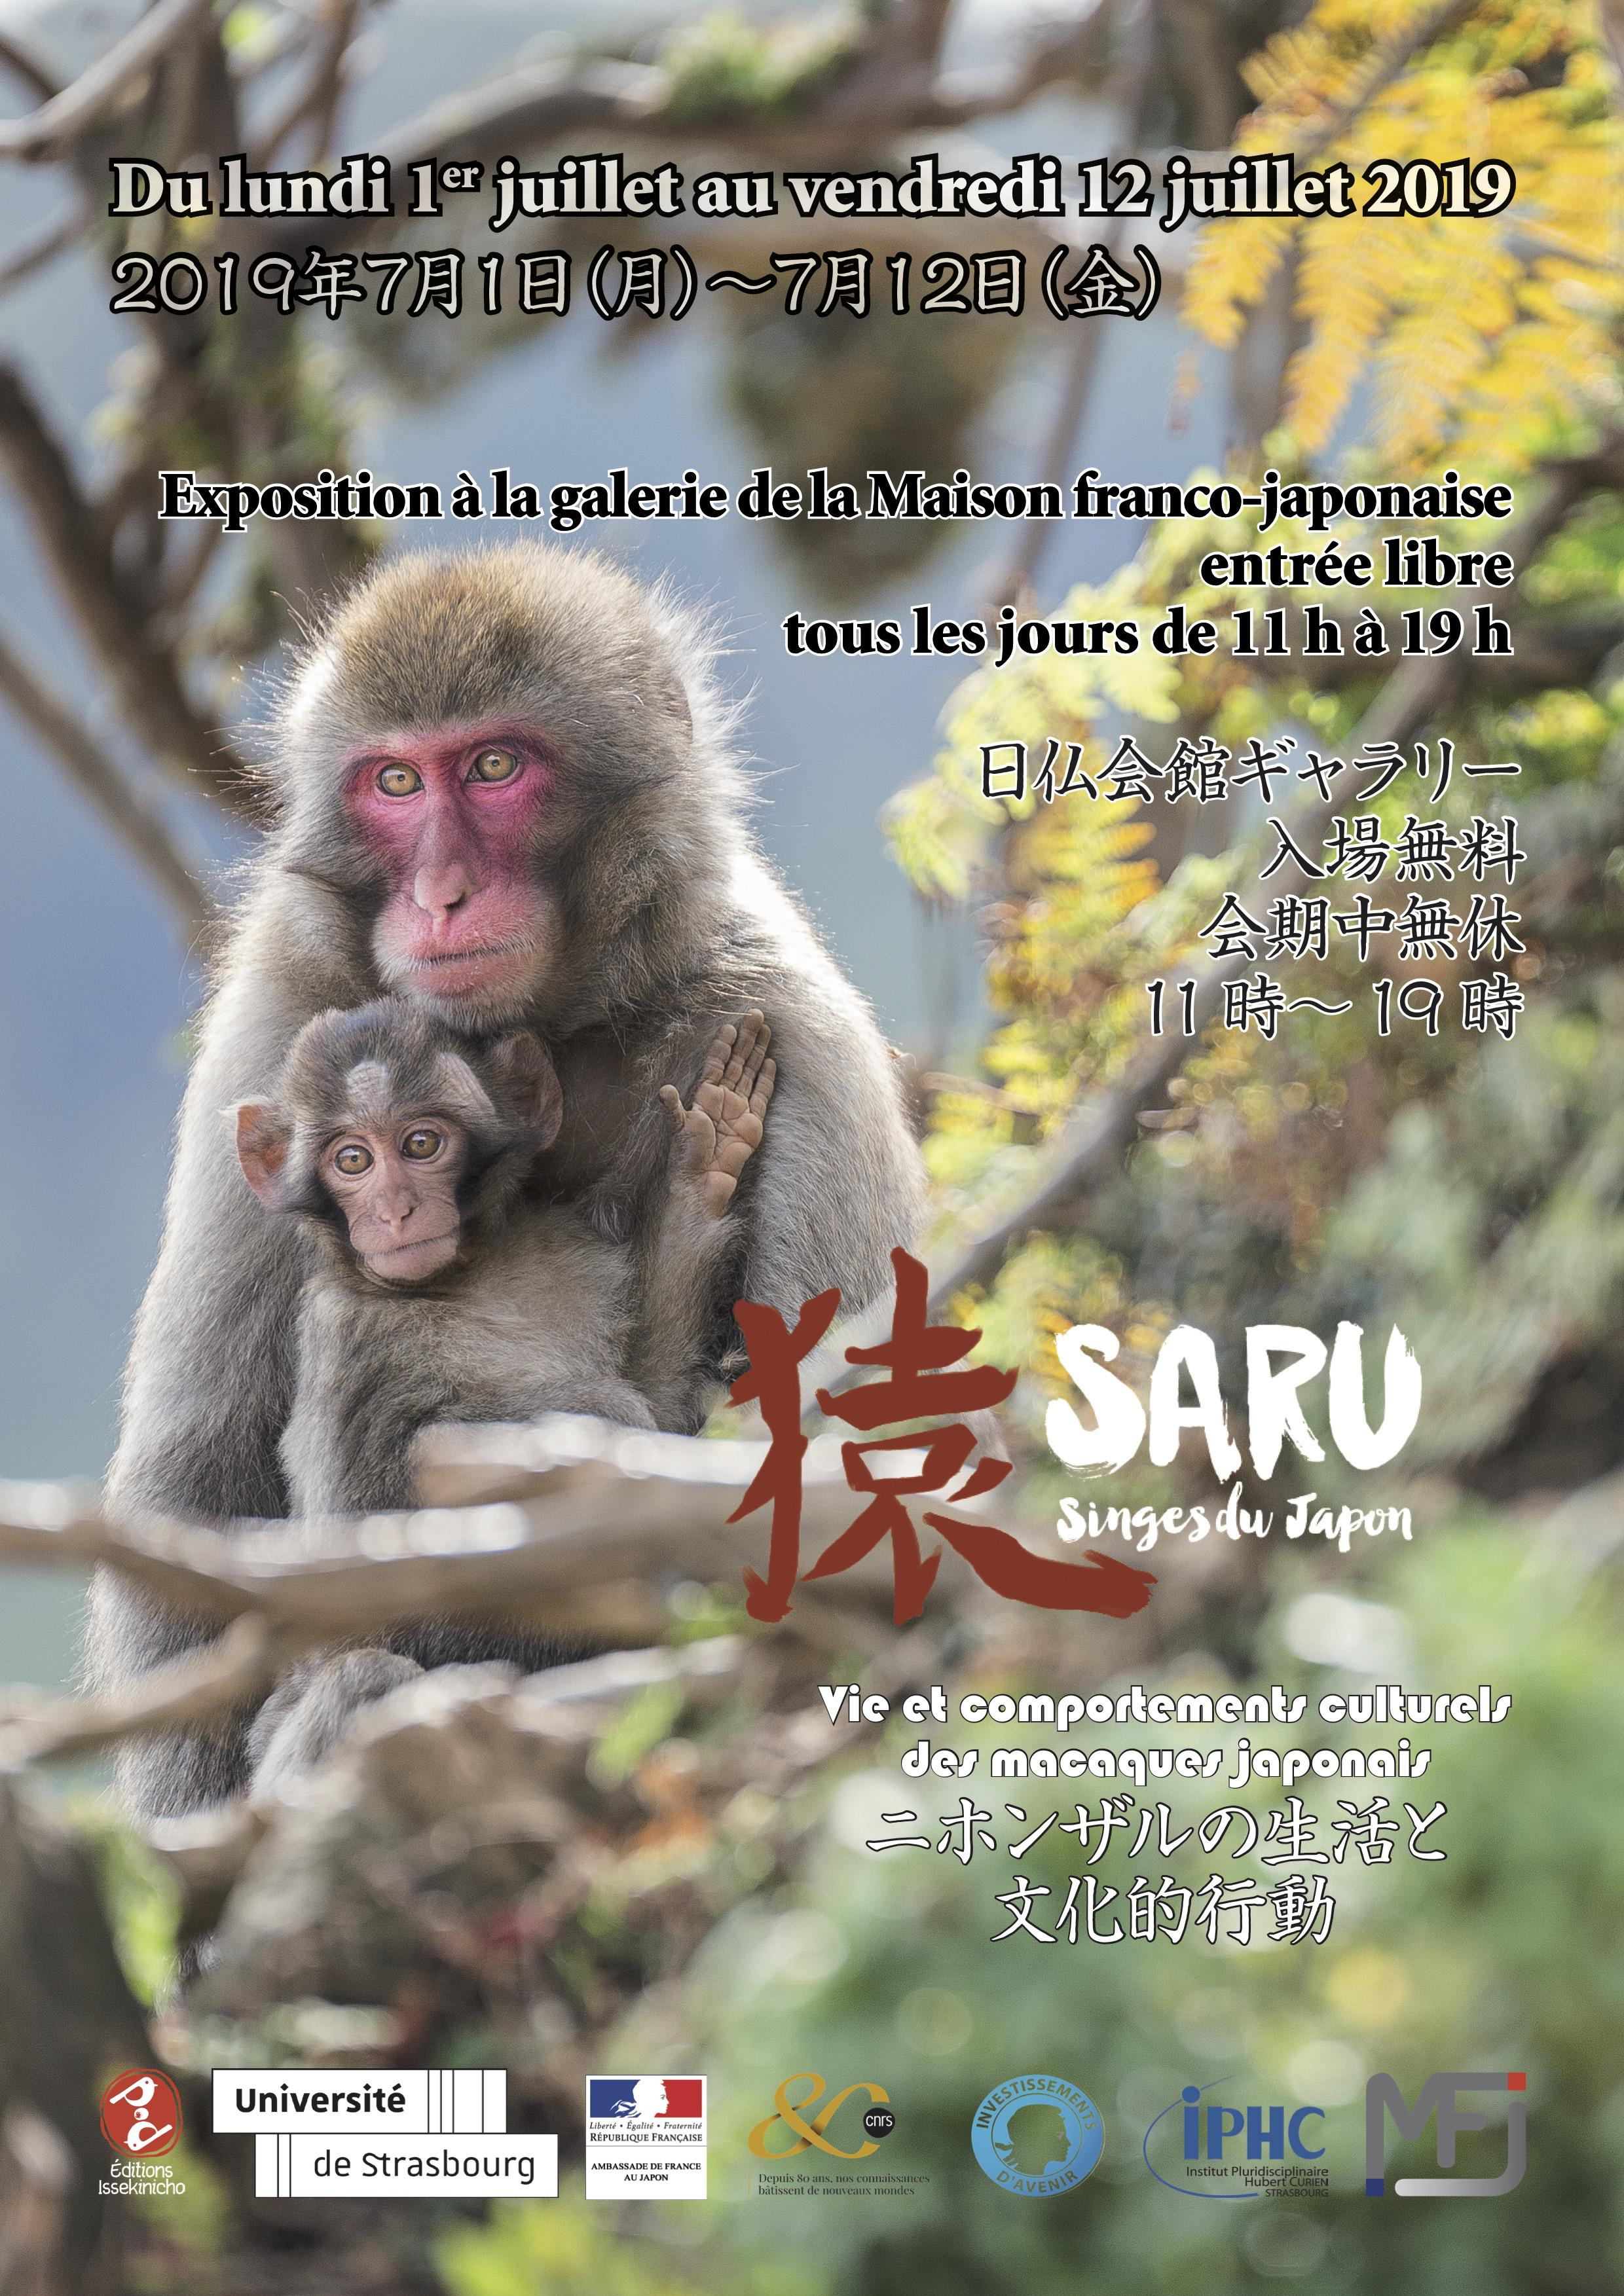 2019-07-01_SARU_Flyer.jpg